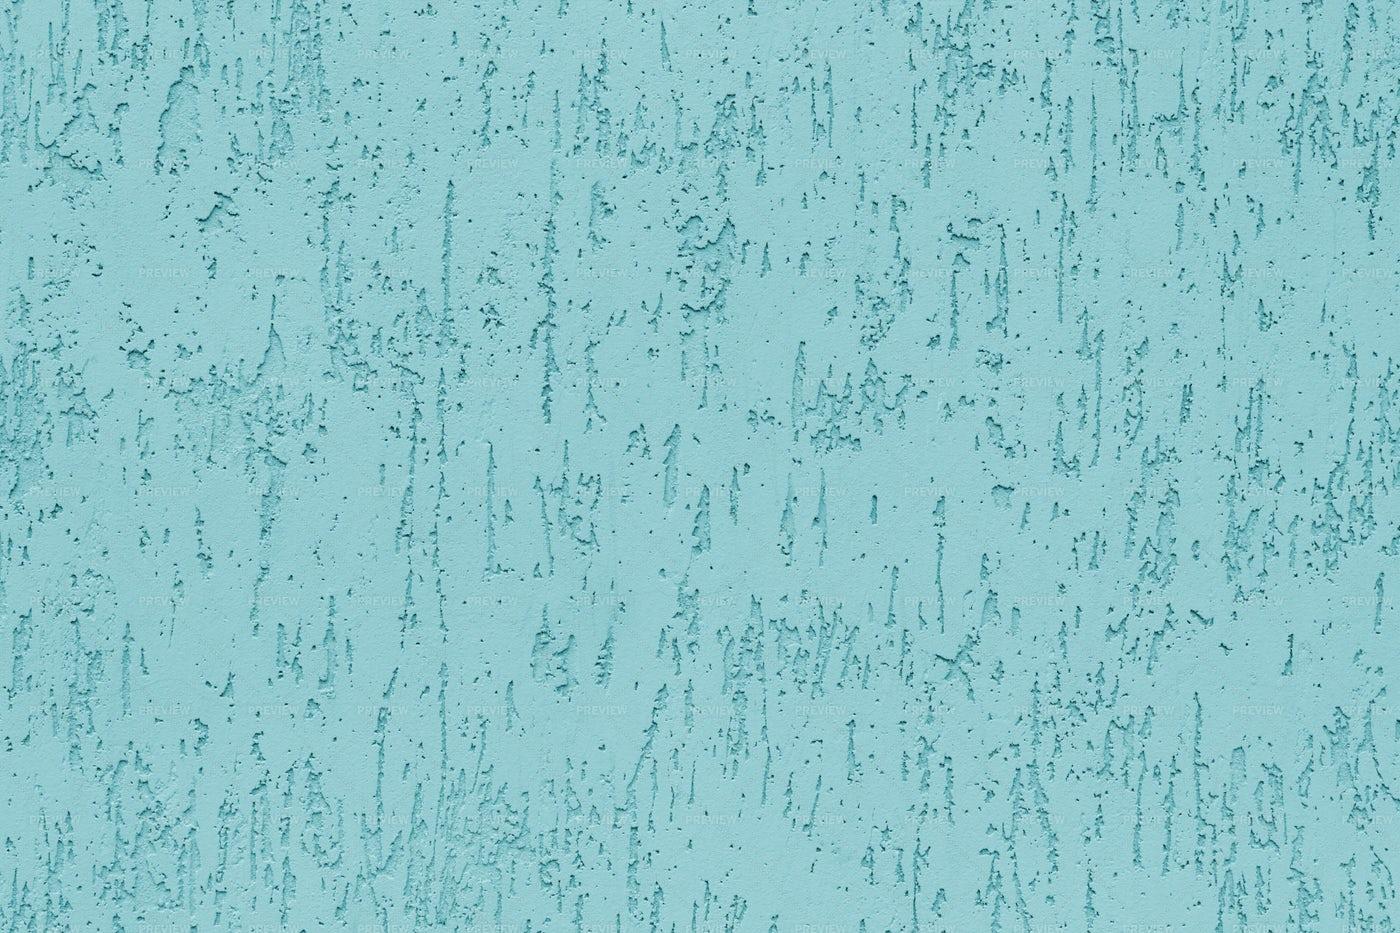 Decorative Wall Plaster Background: Stock Photos